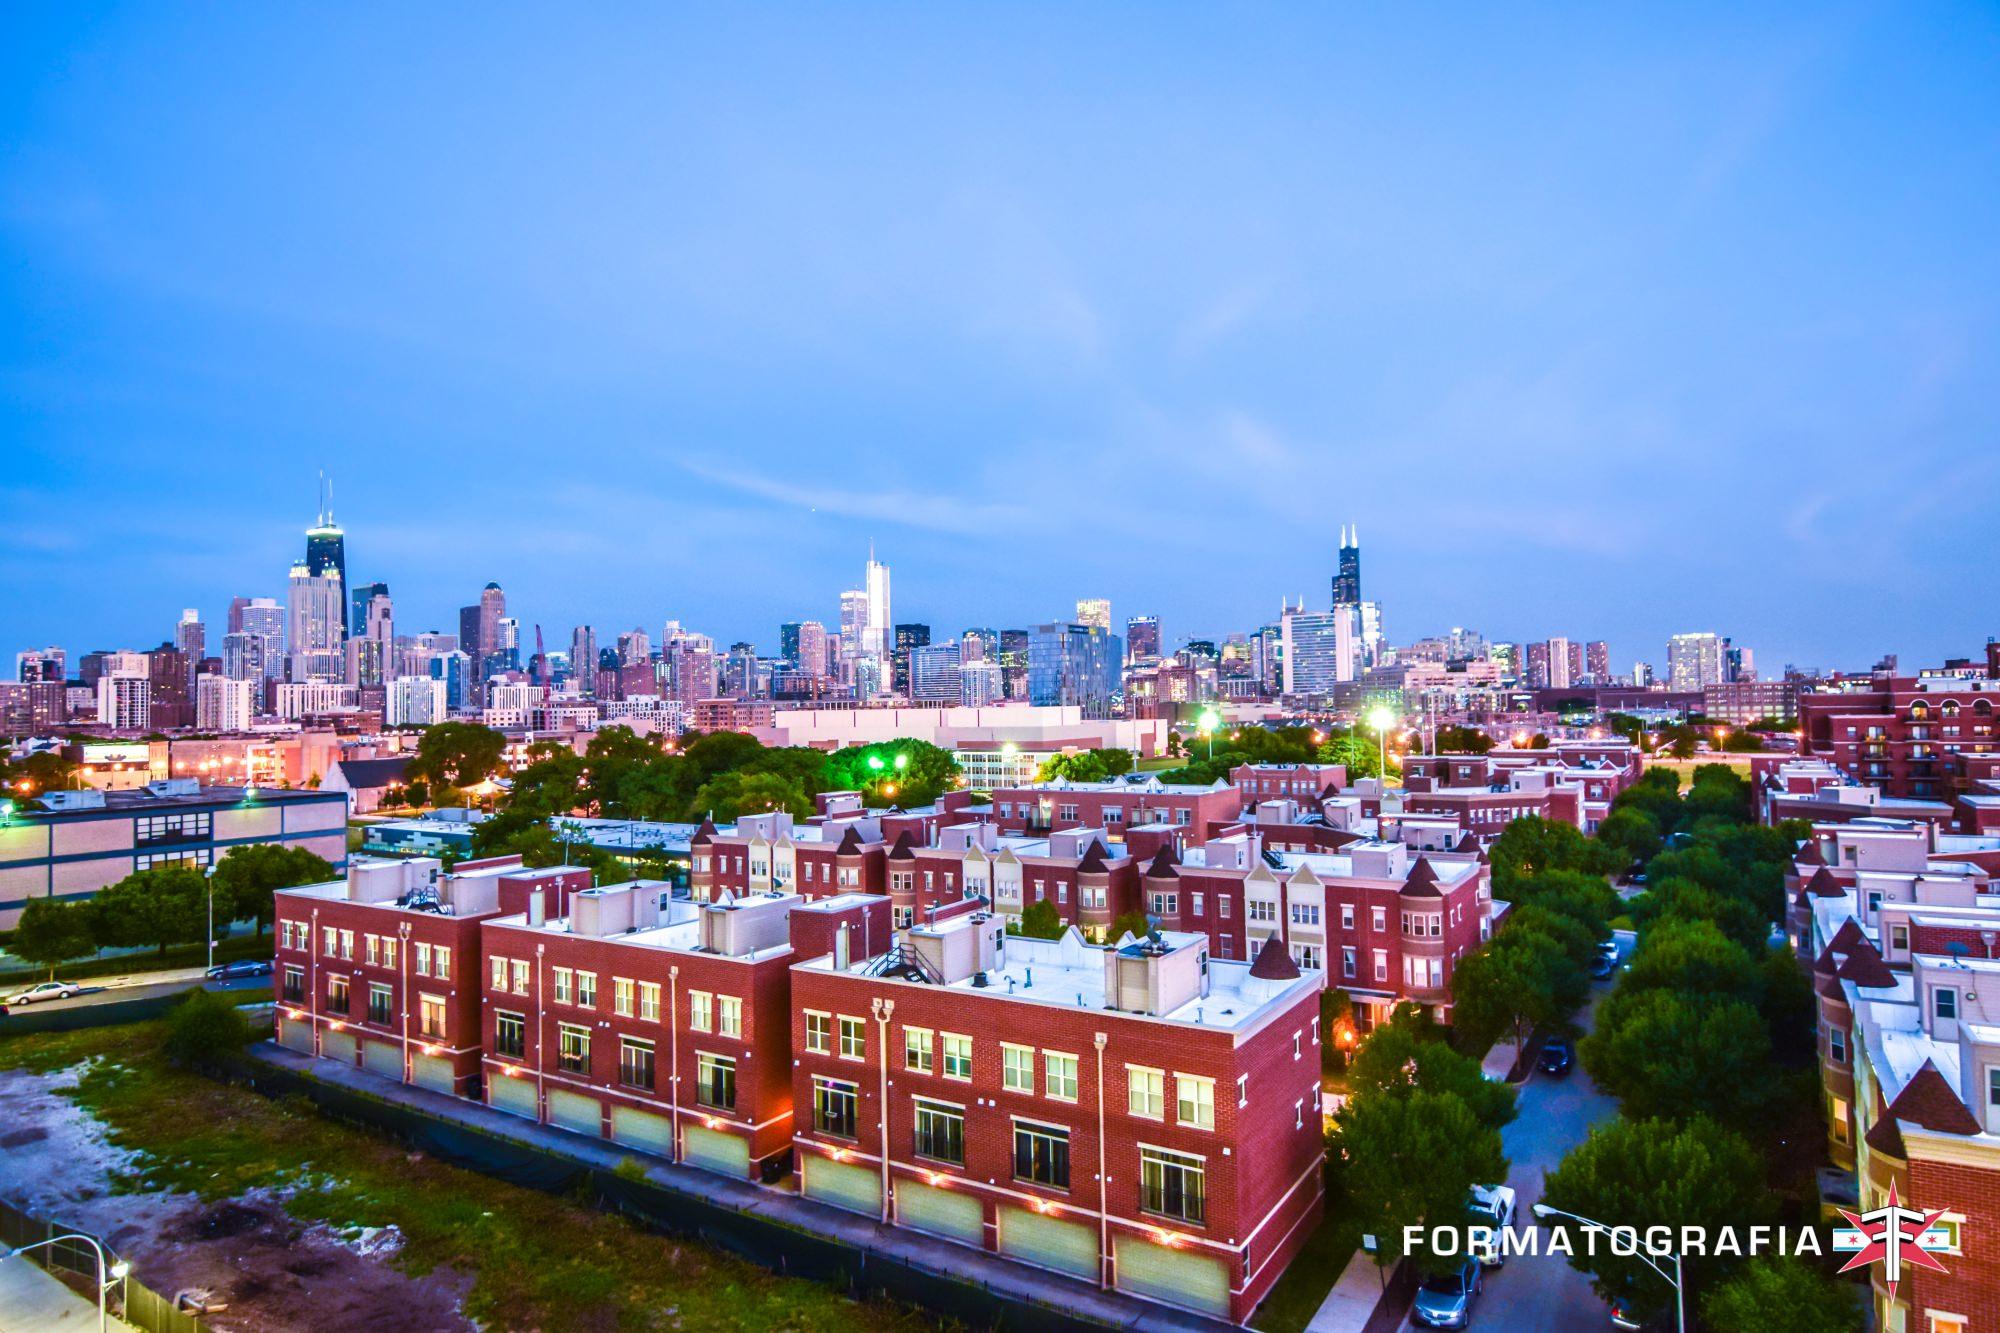 eric formato chicago photographer fall update city architecture shotsDSC_0125-2.jpg